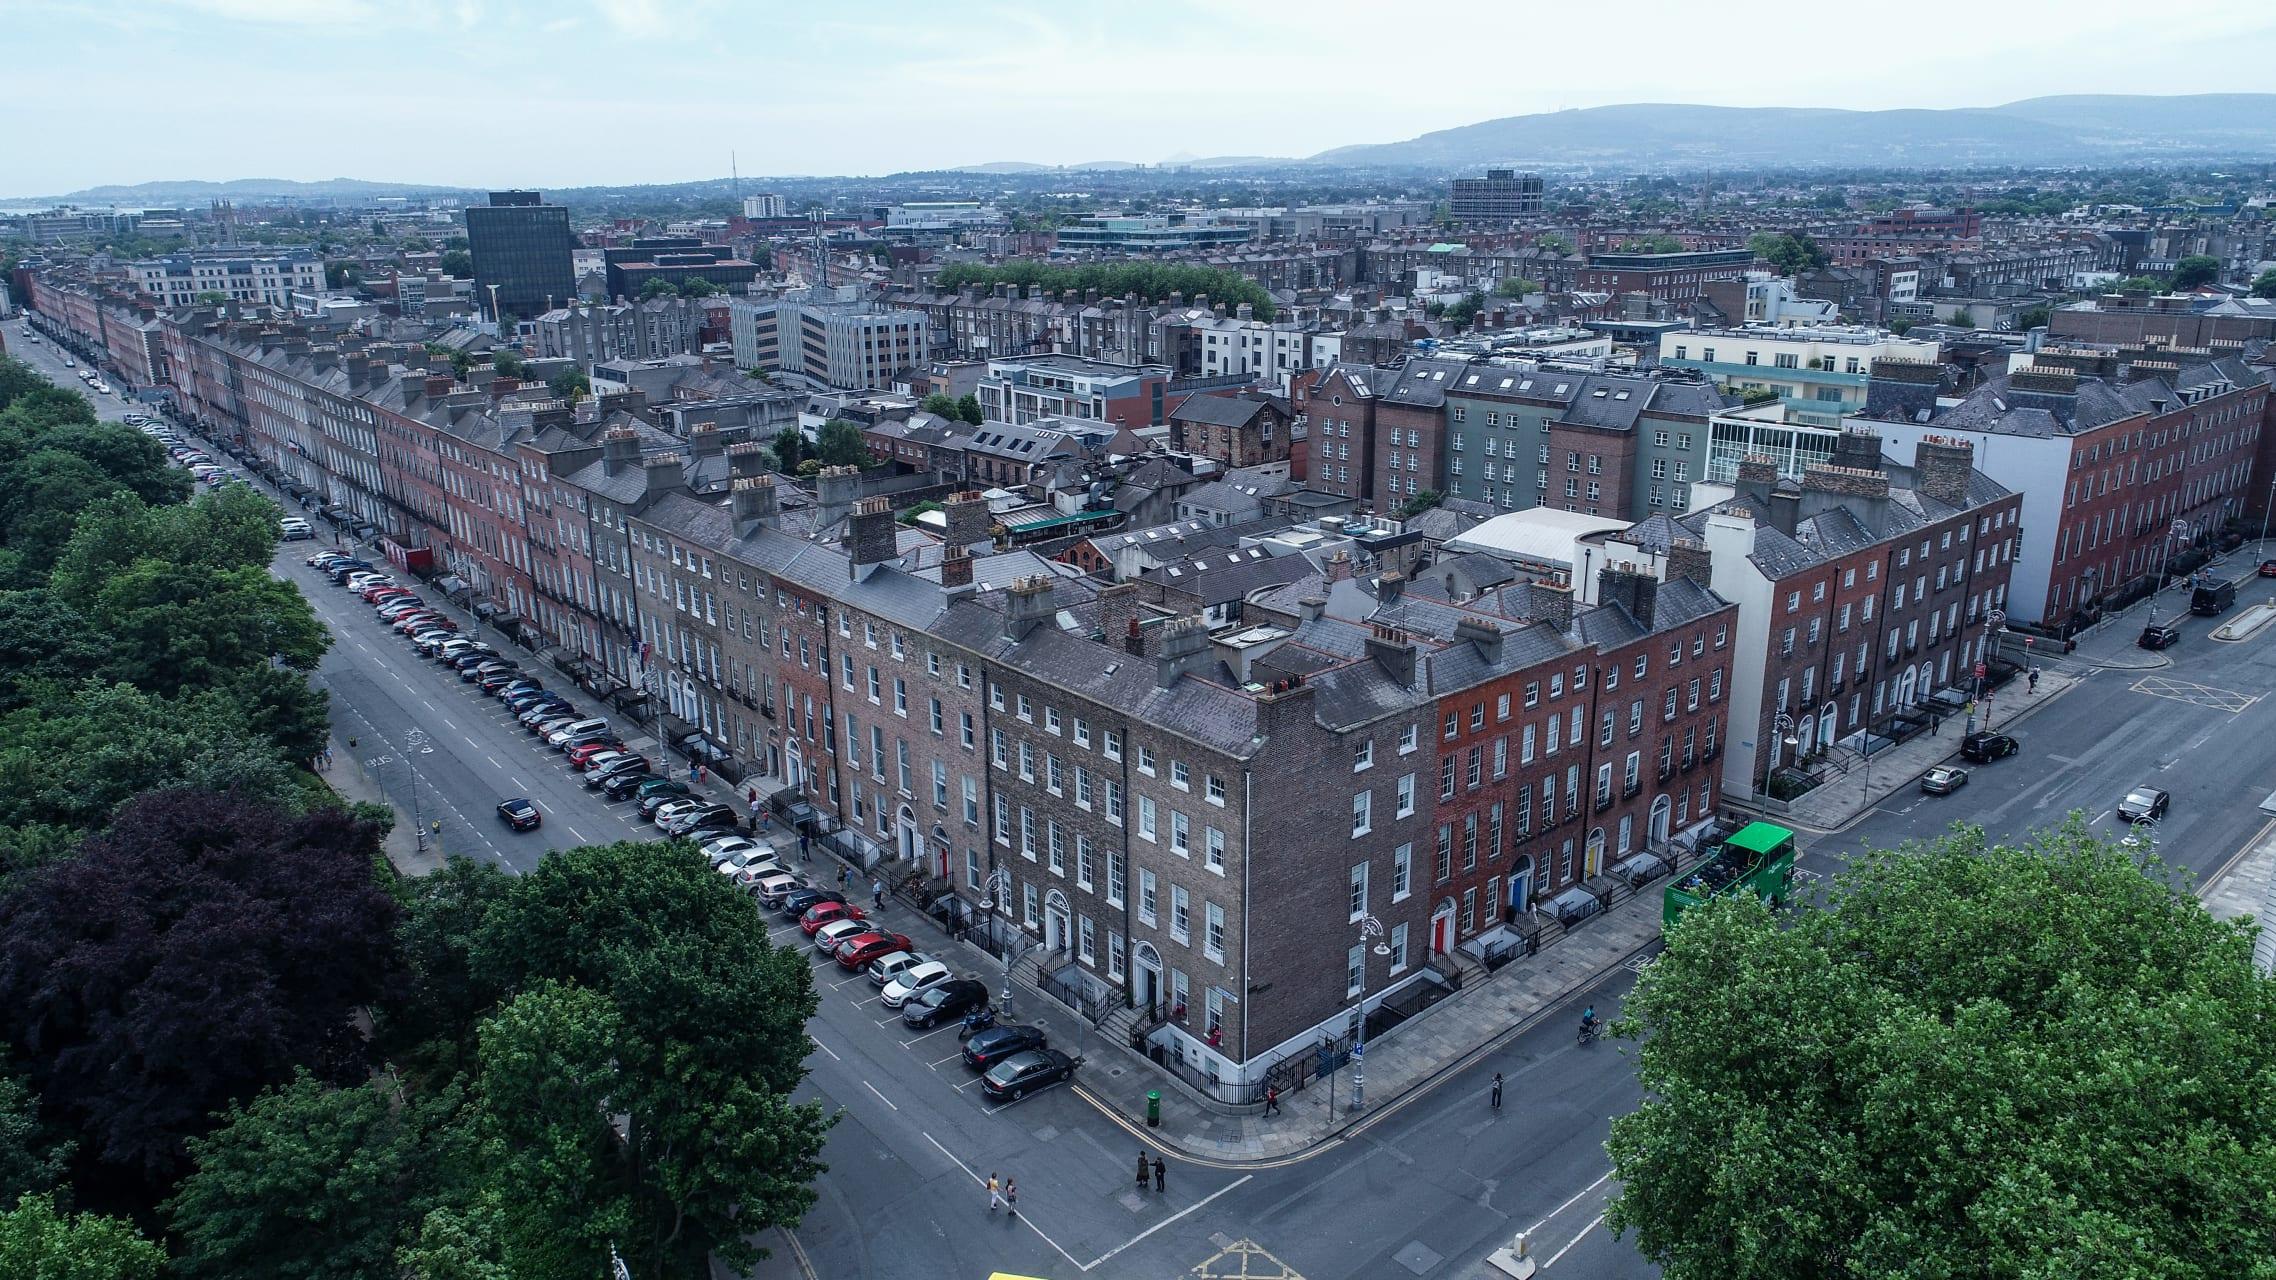 Dublin - Merrion Square  - Featuring Georgian Dublin and Oscar Wilde